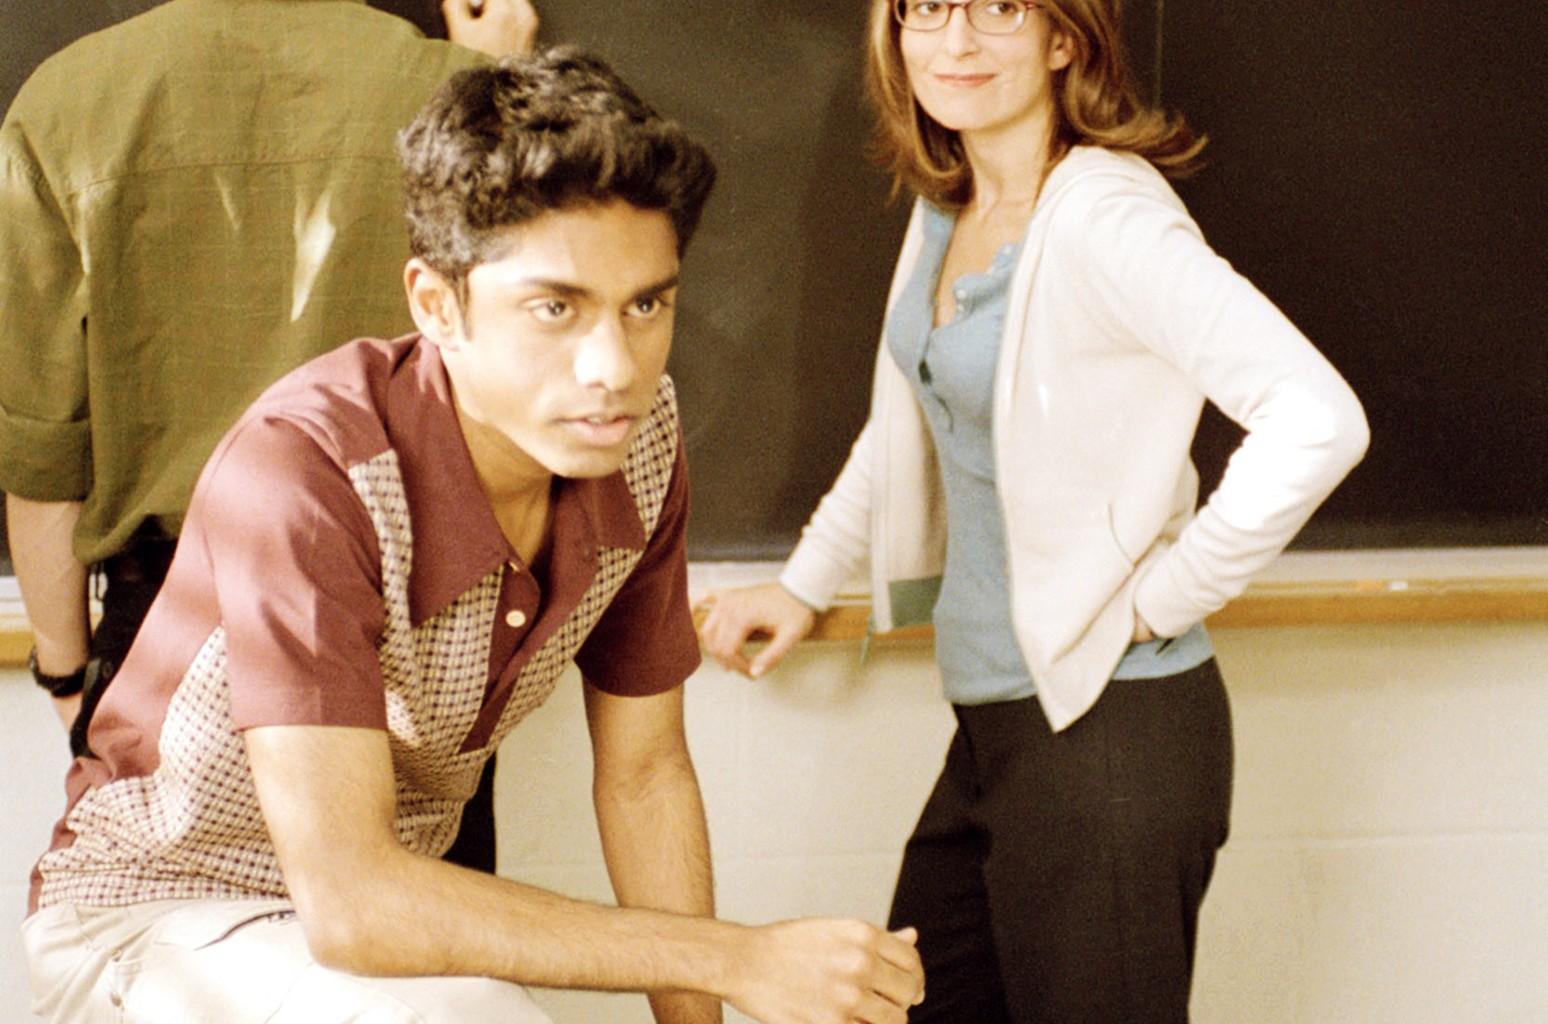 Rajiv Surendra and Tina Fey in 'Mean Girls' in  2004.